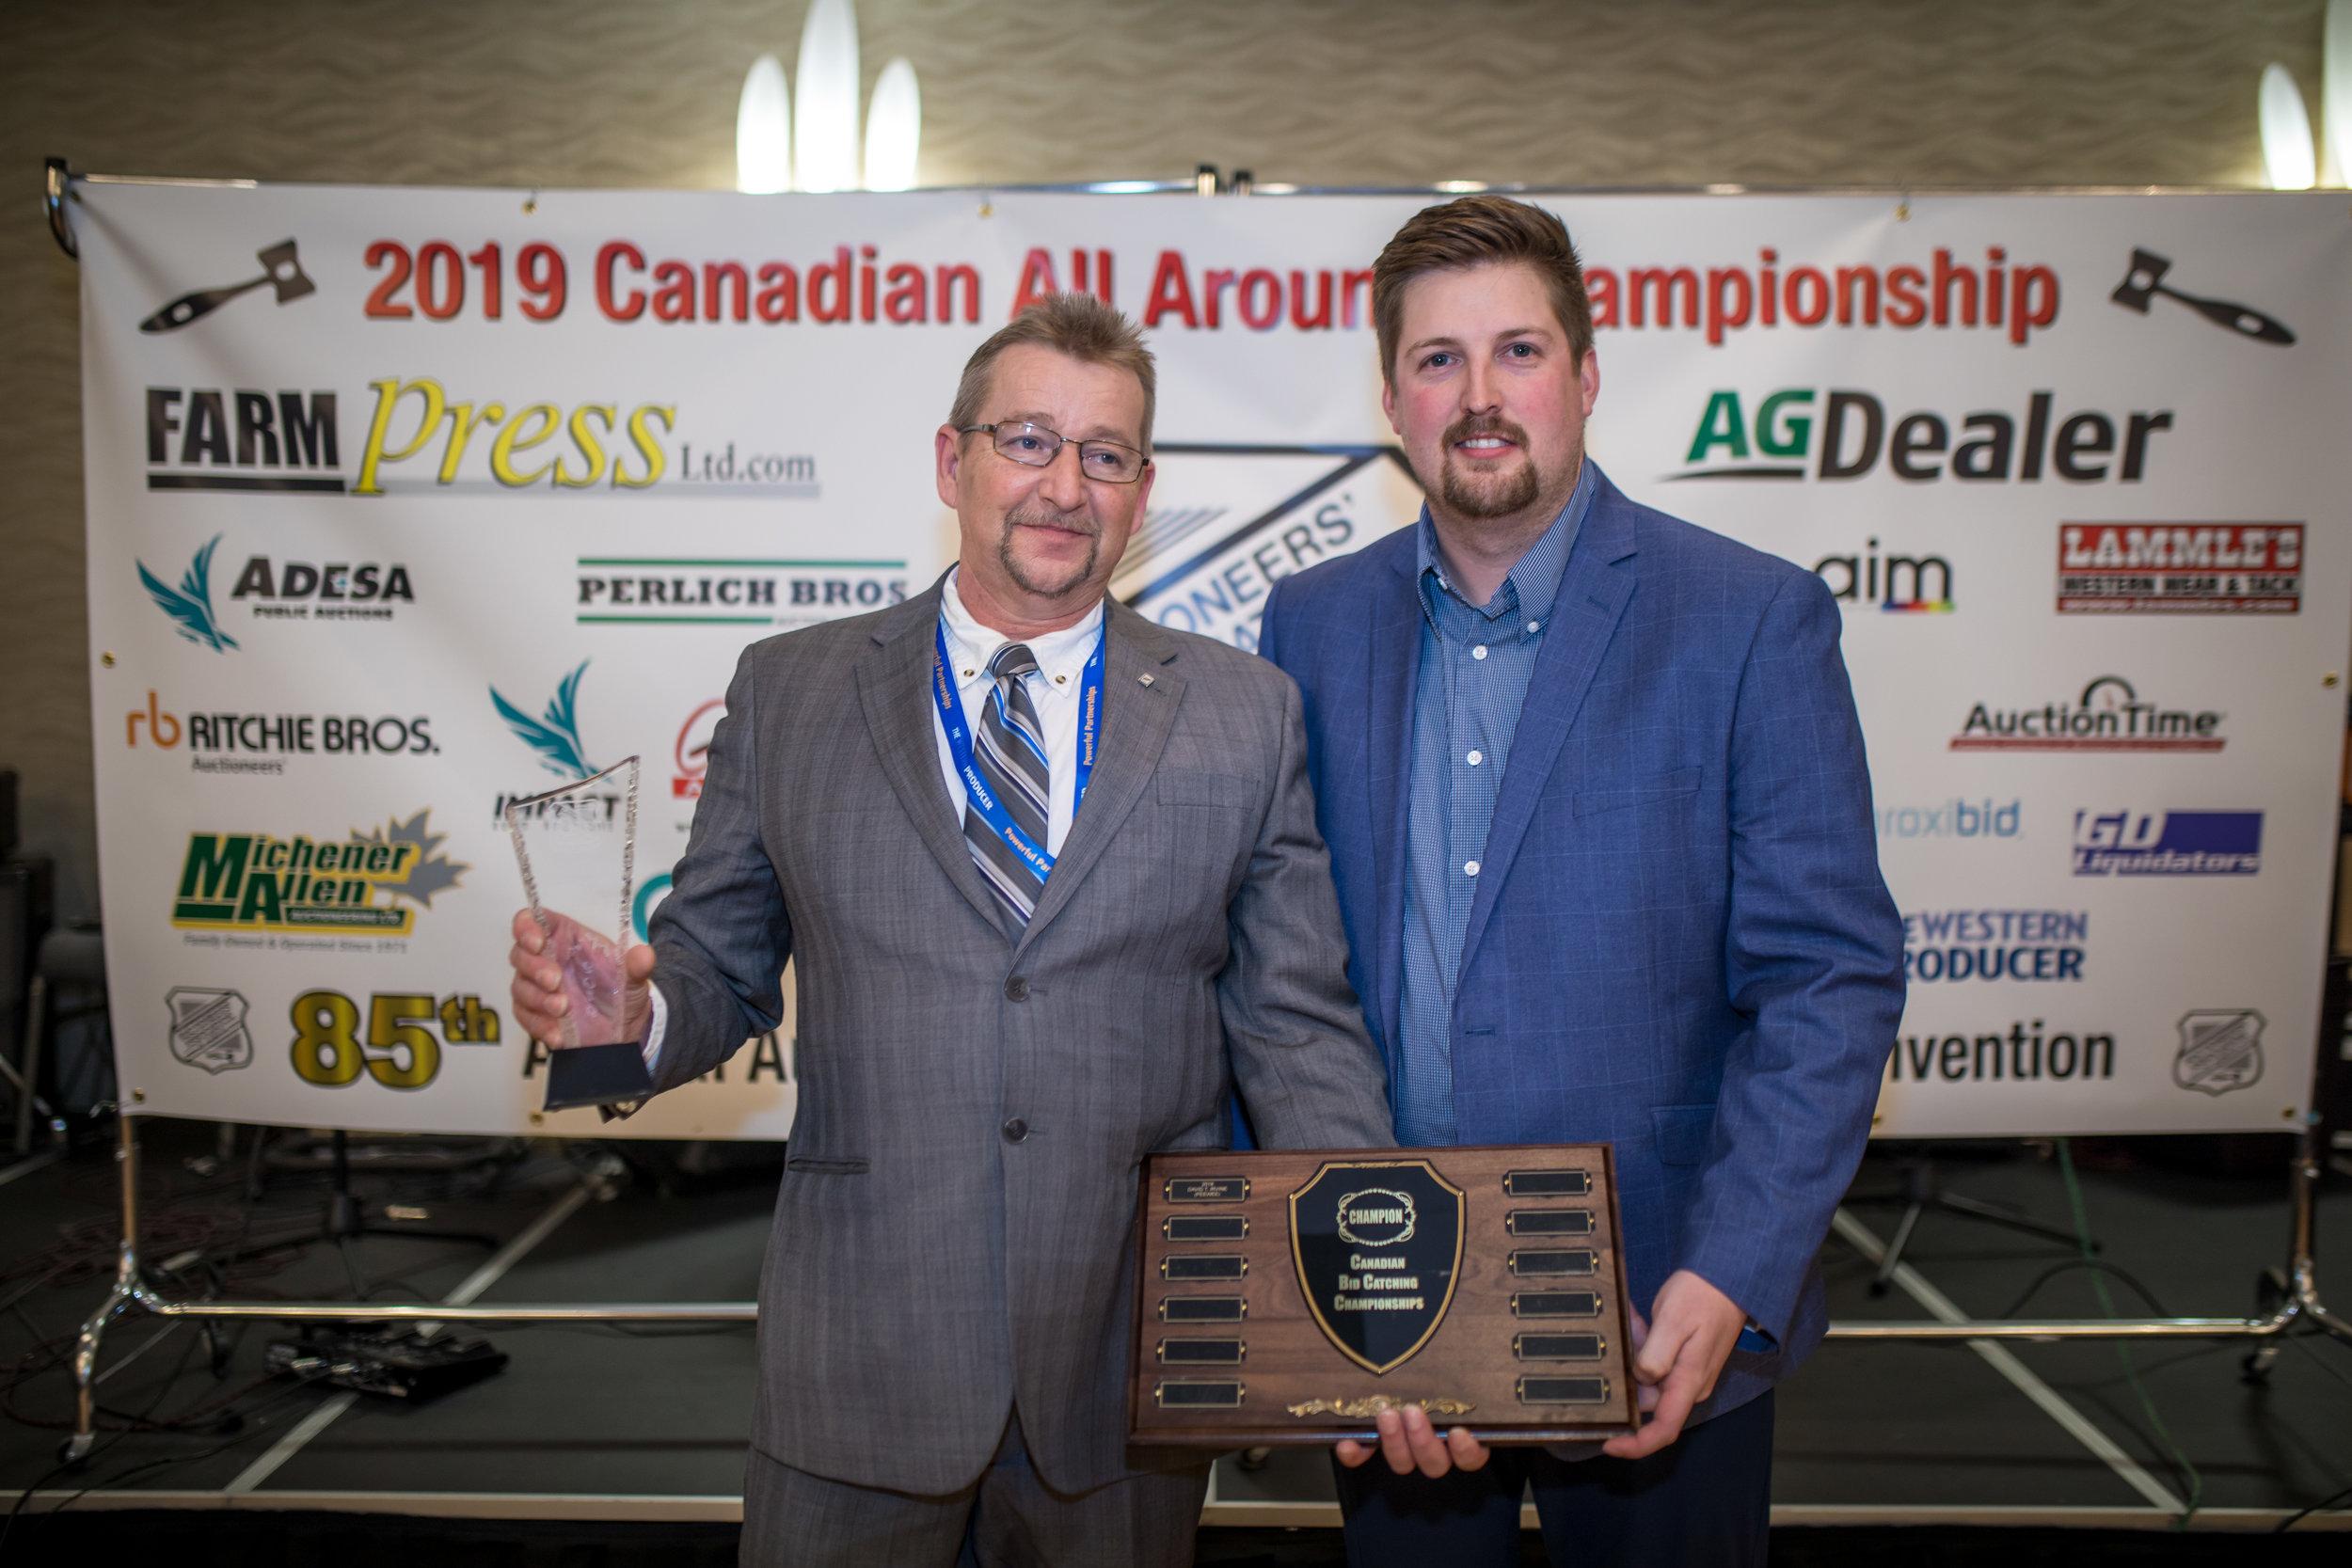 2019 02-02 Alberta Auctioneer Convention Day 03 - Calgary 61.jpg